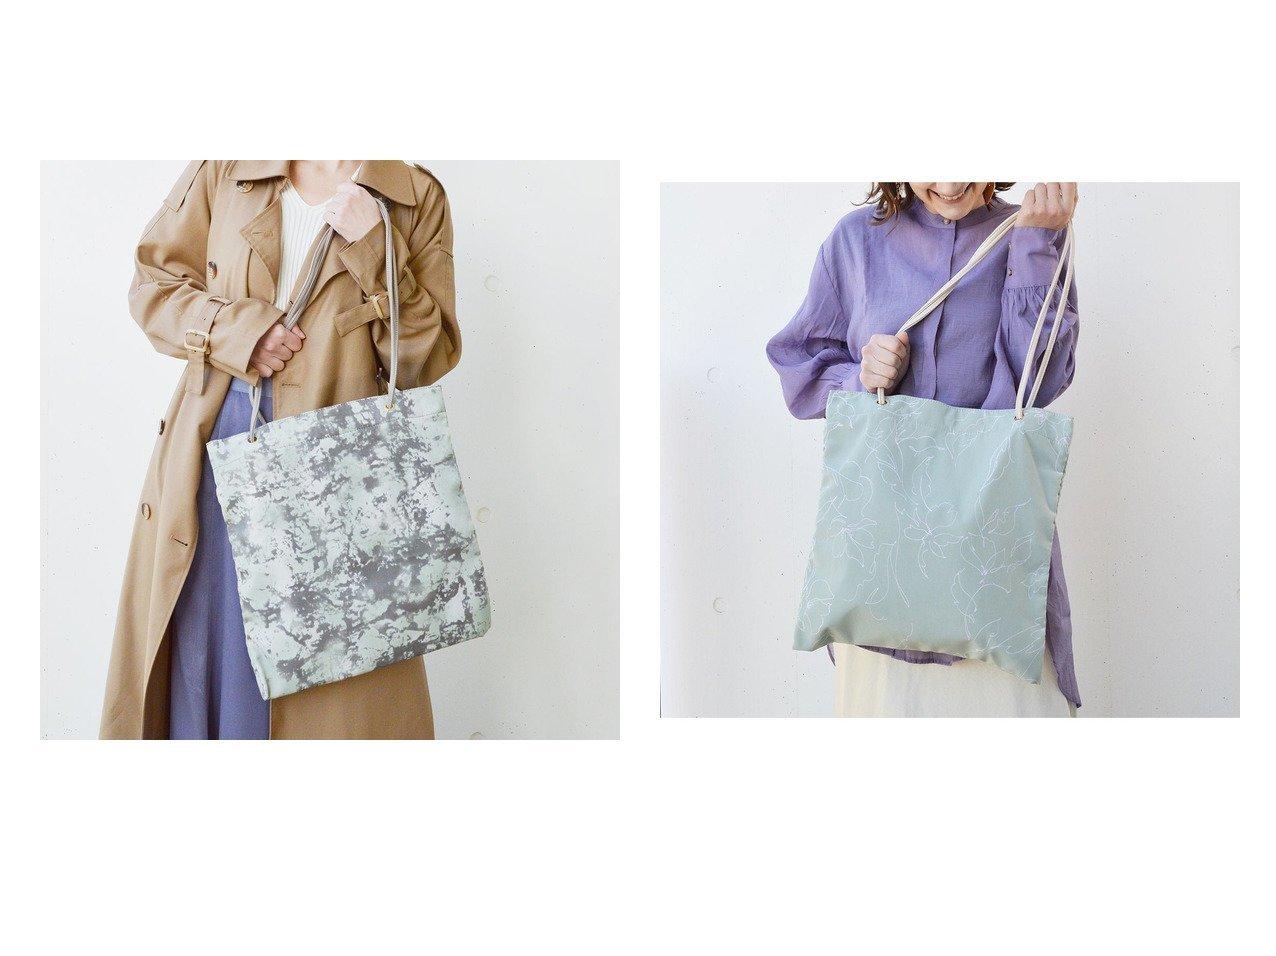 【styiro/スタイロ】の線画花柄フラットエコトートバッグ&タイダイ柄フラットエコトートバッグ バッグ・鞄のおすすめ!人気、トレンド・レディースファッションの通販 おすすめで人気の流行・トレンド、ファッションの通販商品 メンズファッション・キッズファッション・インテリア・家具・レディースファッション・服の通販 founy(ファニー) https://founy.com/ ファッション Fashion レディースファッション WOMEN バッグ Bag アクセサリー 財布 フラット |ID:crp329100000014998